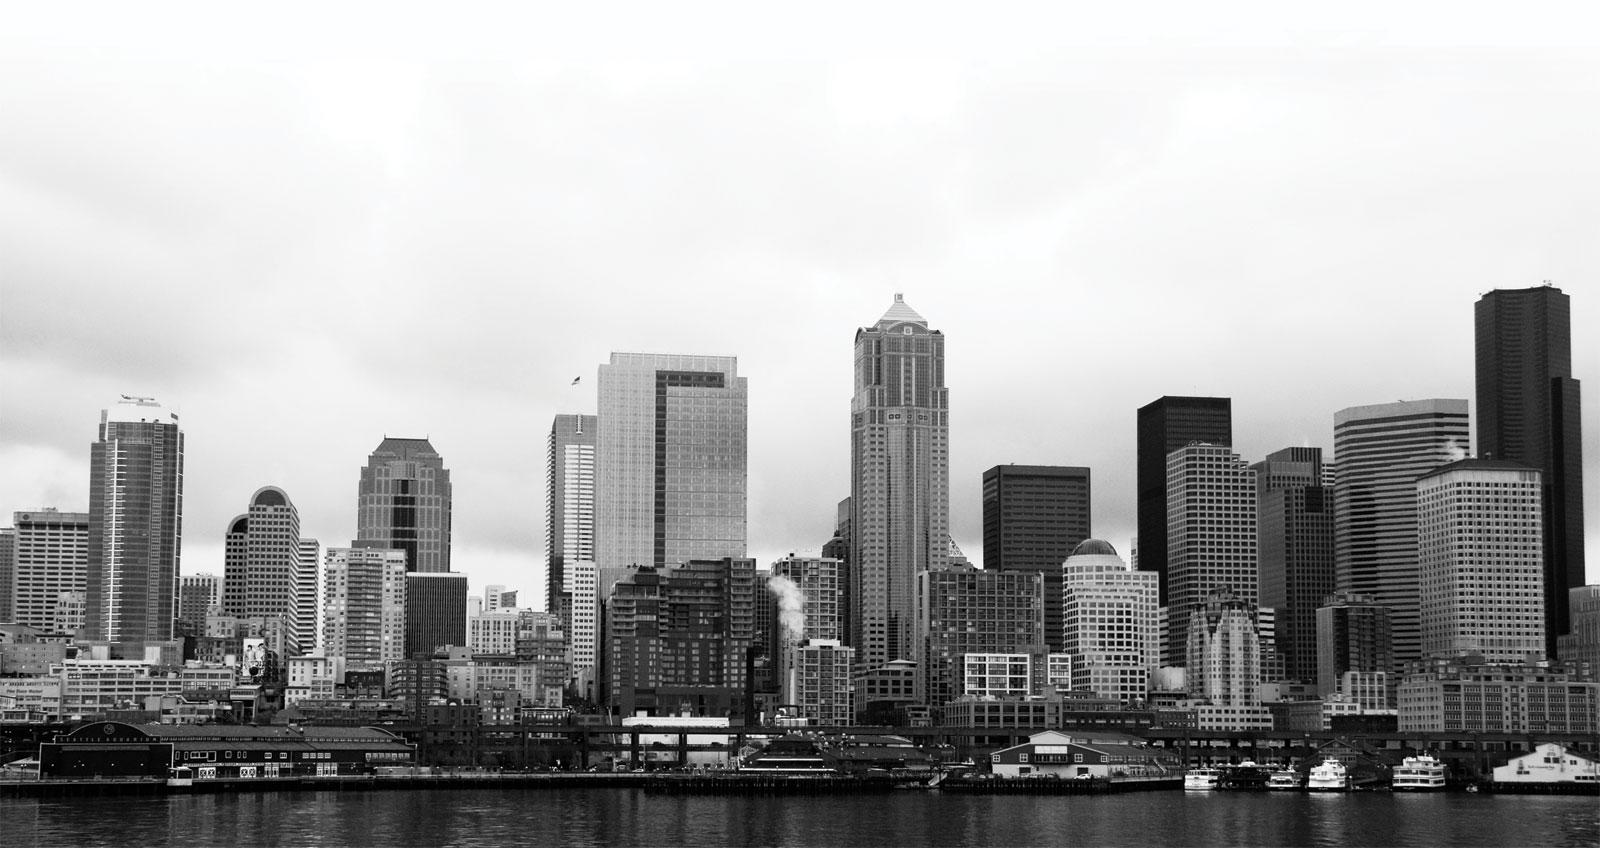 Background City - WallpaperSafari